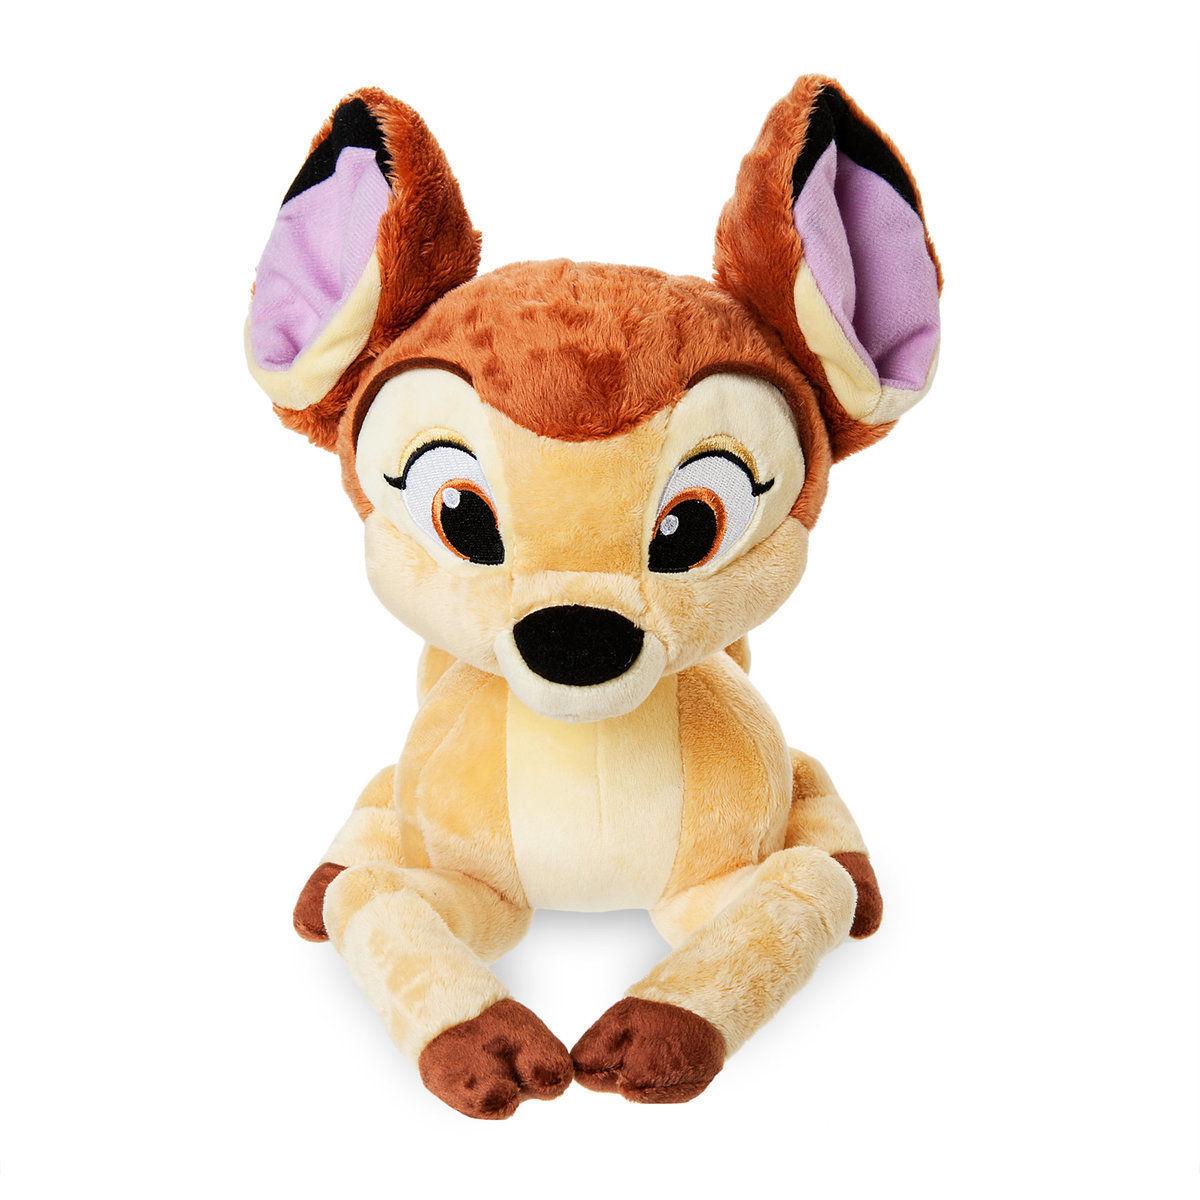 Disney Store Bambi Medium Plush New With Tags